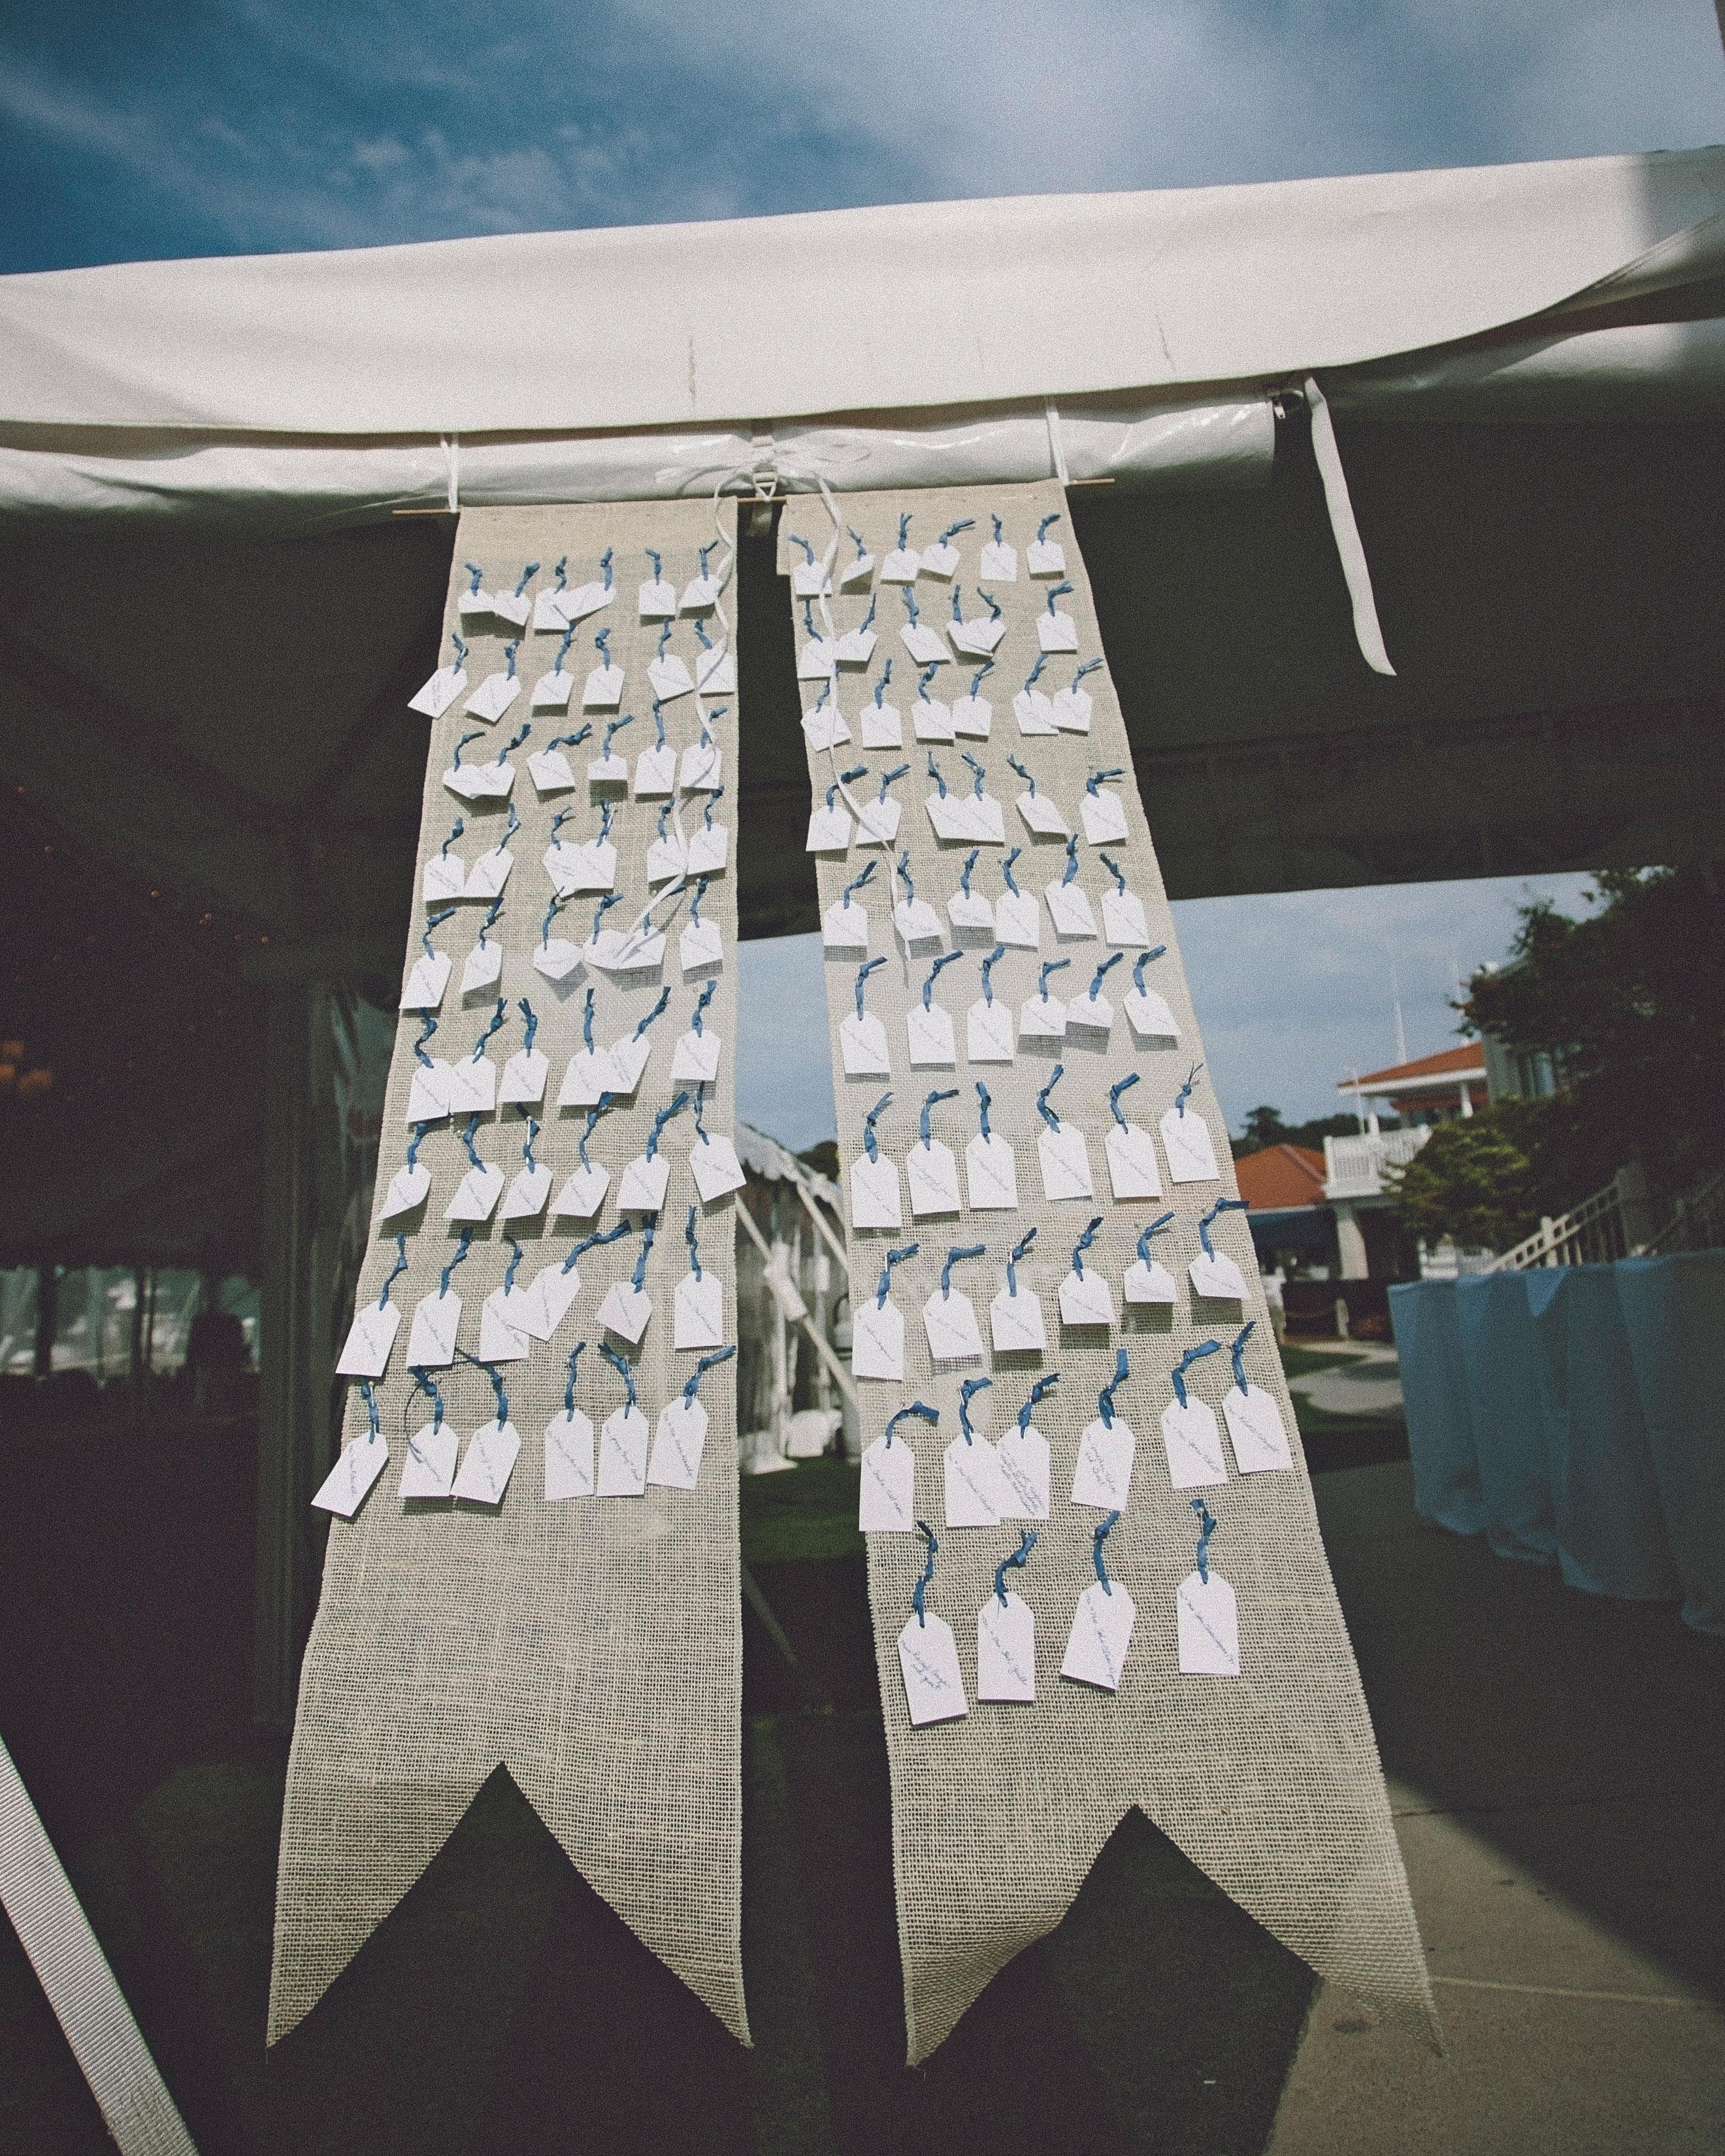 molly-greg-wedding-escortcards-00043-s111481-0814.jpg